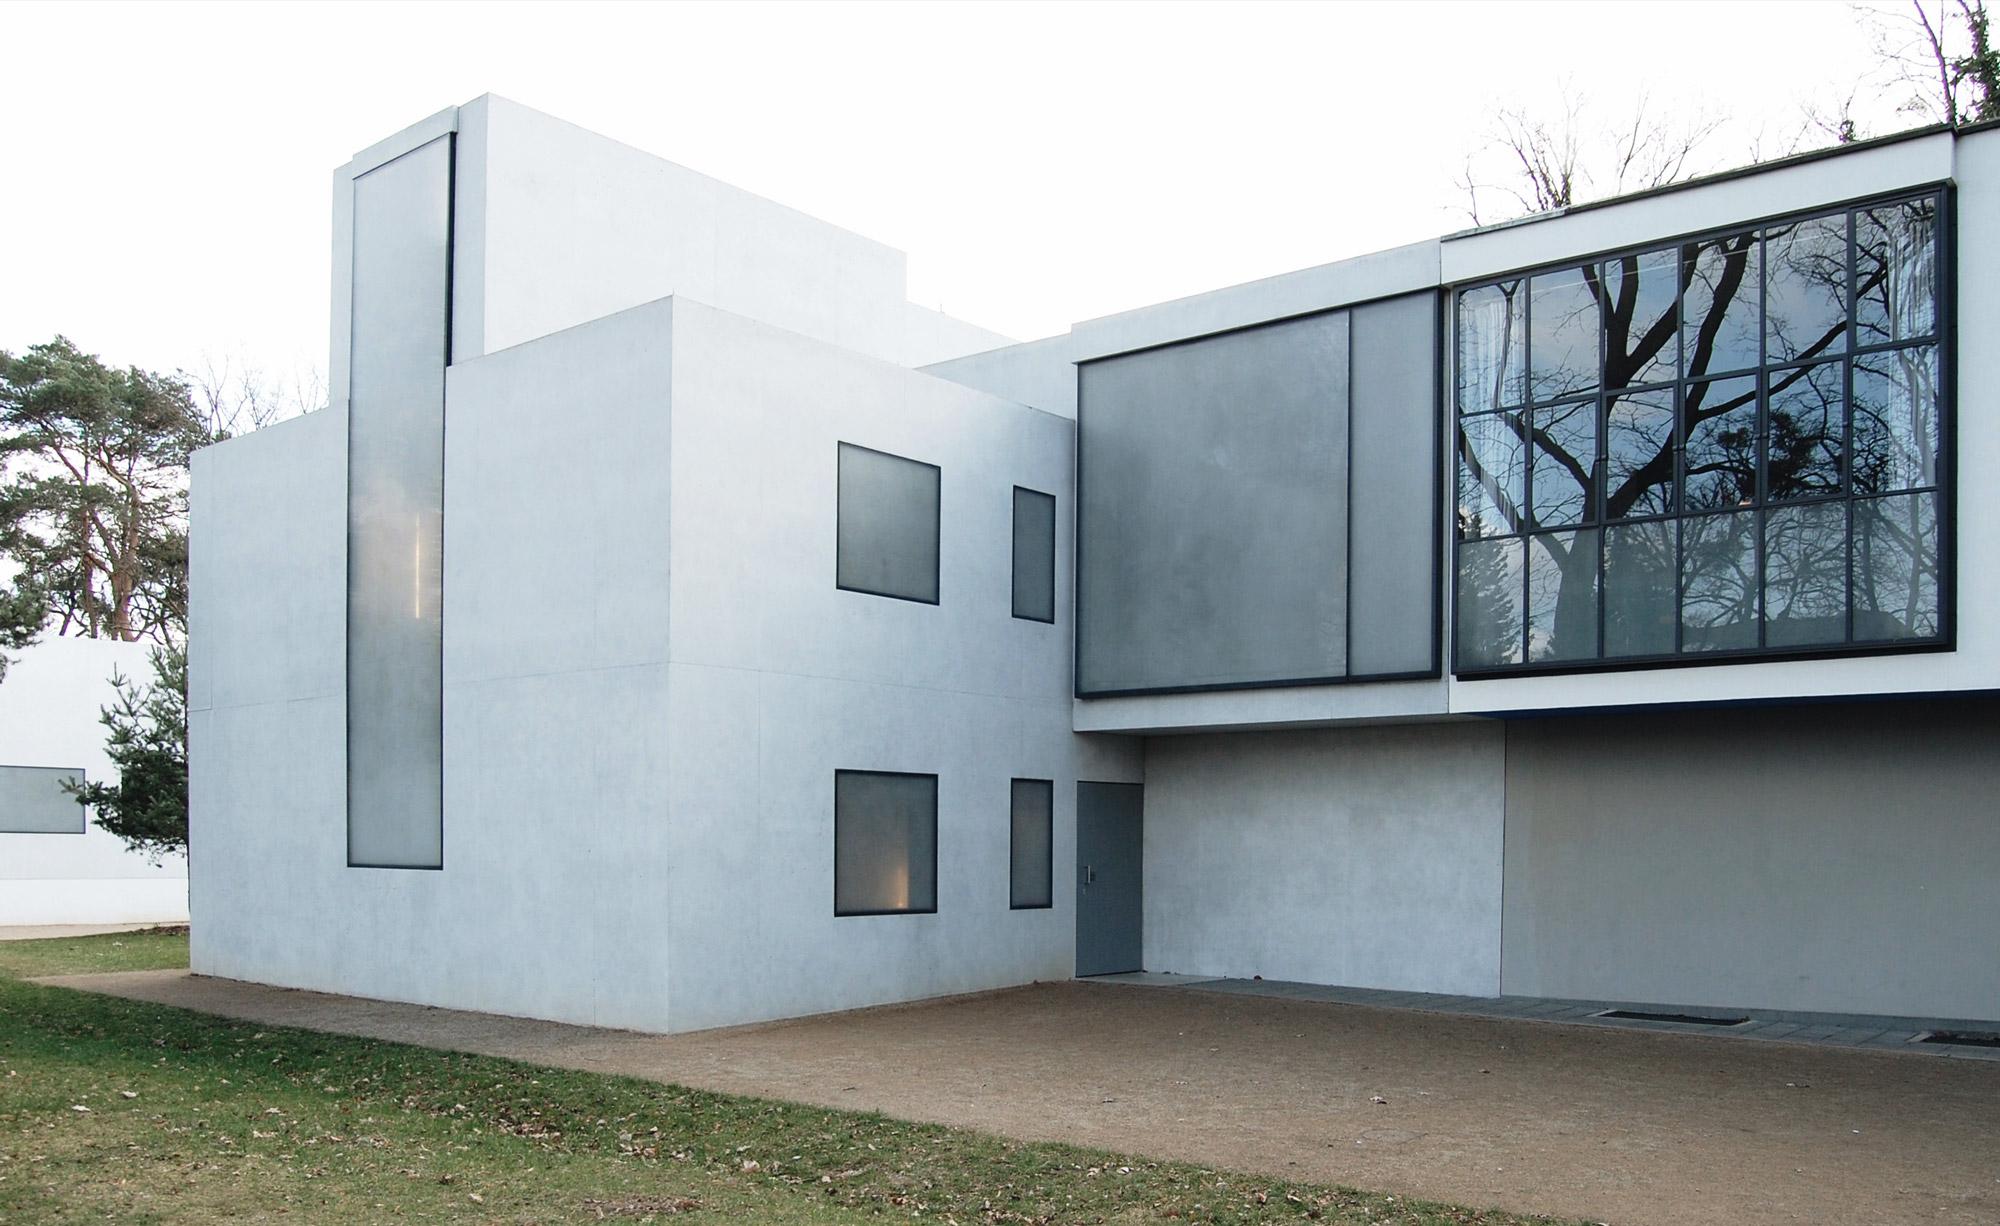 urbanbacklog-acanthus-dessau-meisterhäuser-2.jpg